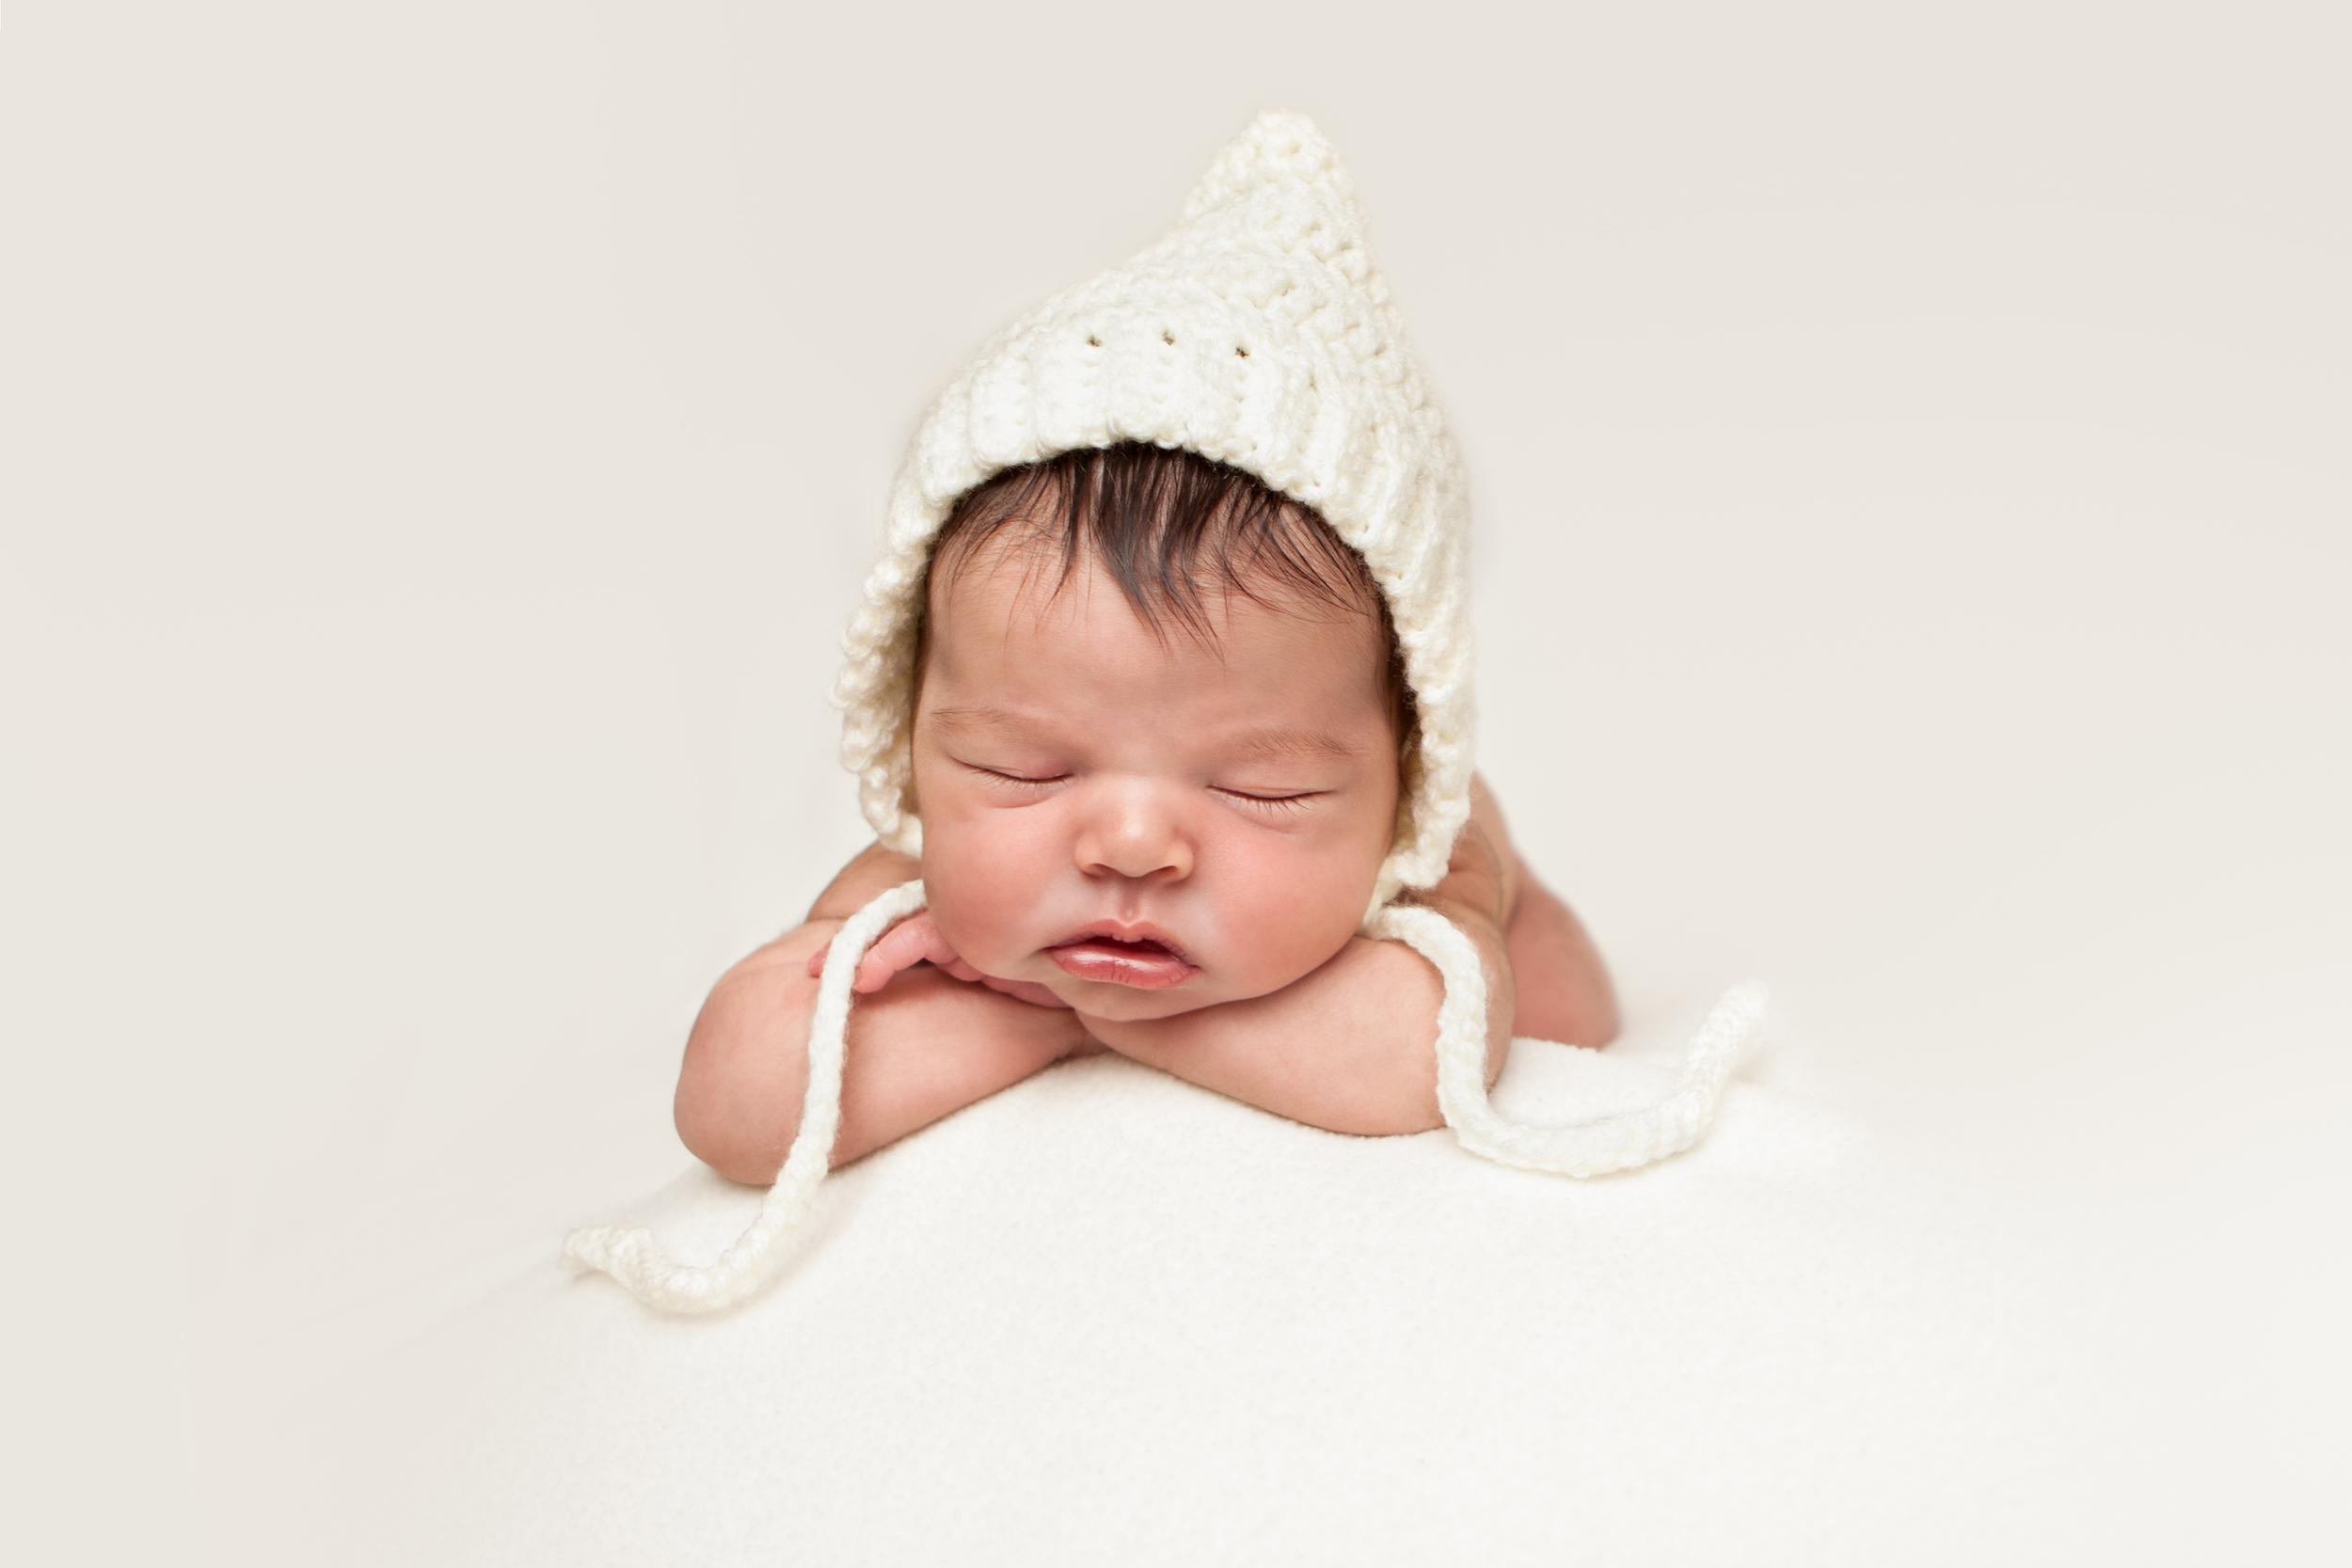 Newborn baby girl white blanket creme bonnet chin on wrists, Westchester County, NY Newborn Photographer Amanda Noelle Photography.